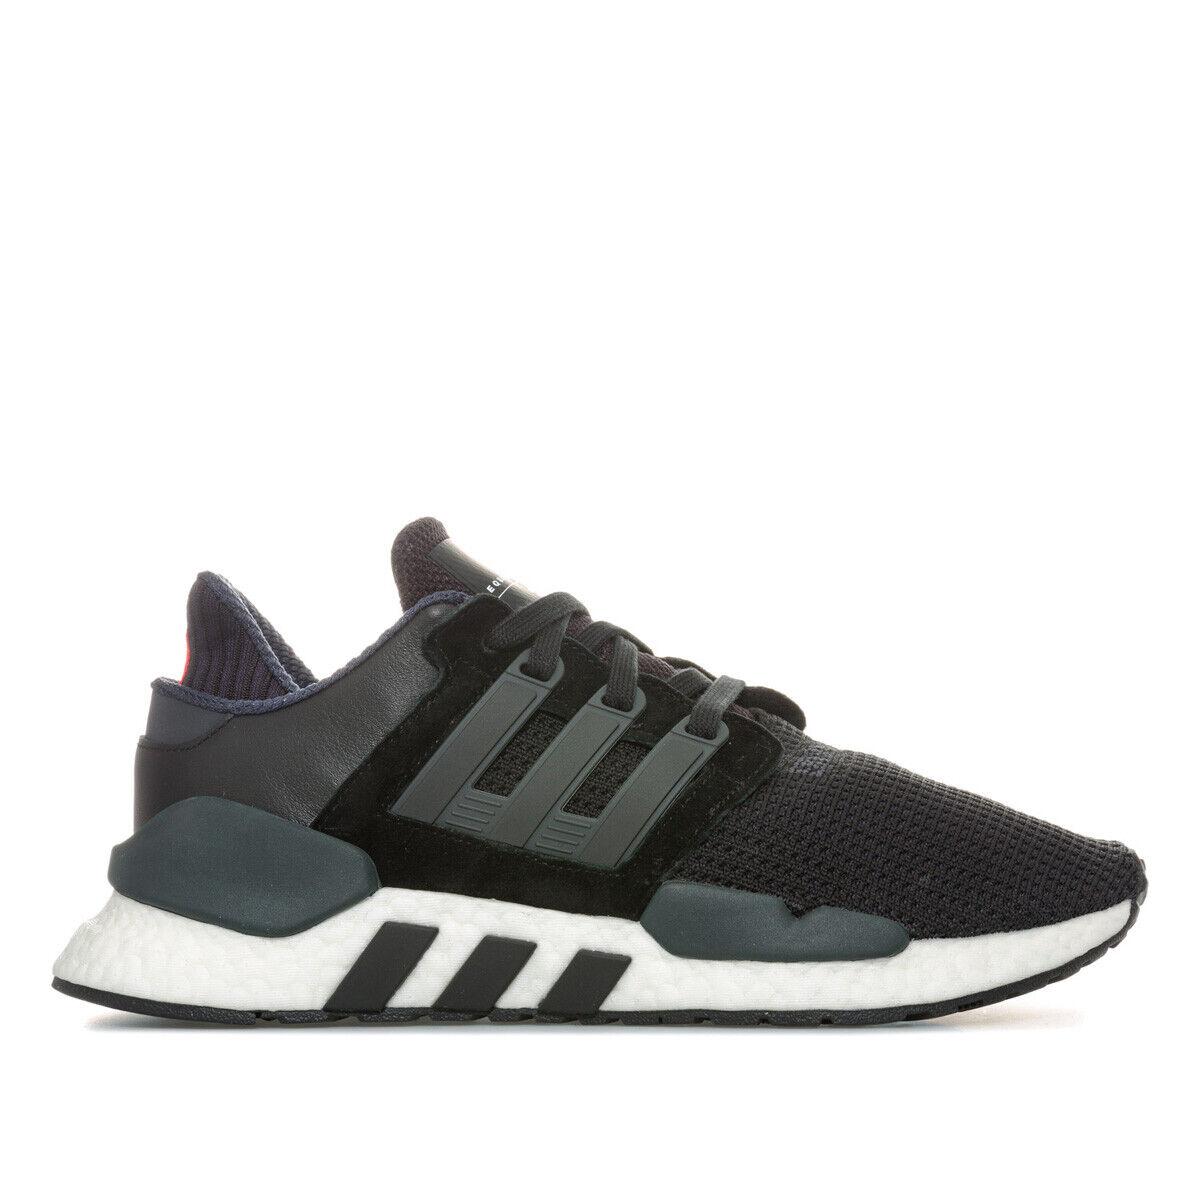 Mens Adidas EQT Support 9118 BlackWhite Trainers (TGF39) RRP £149.99